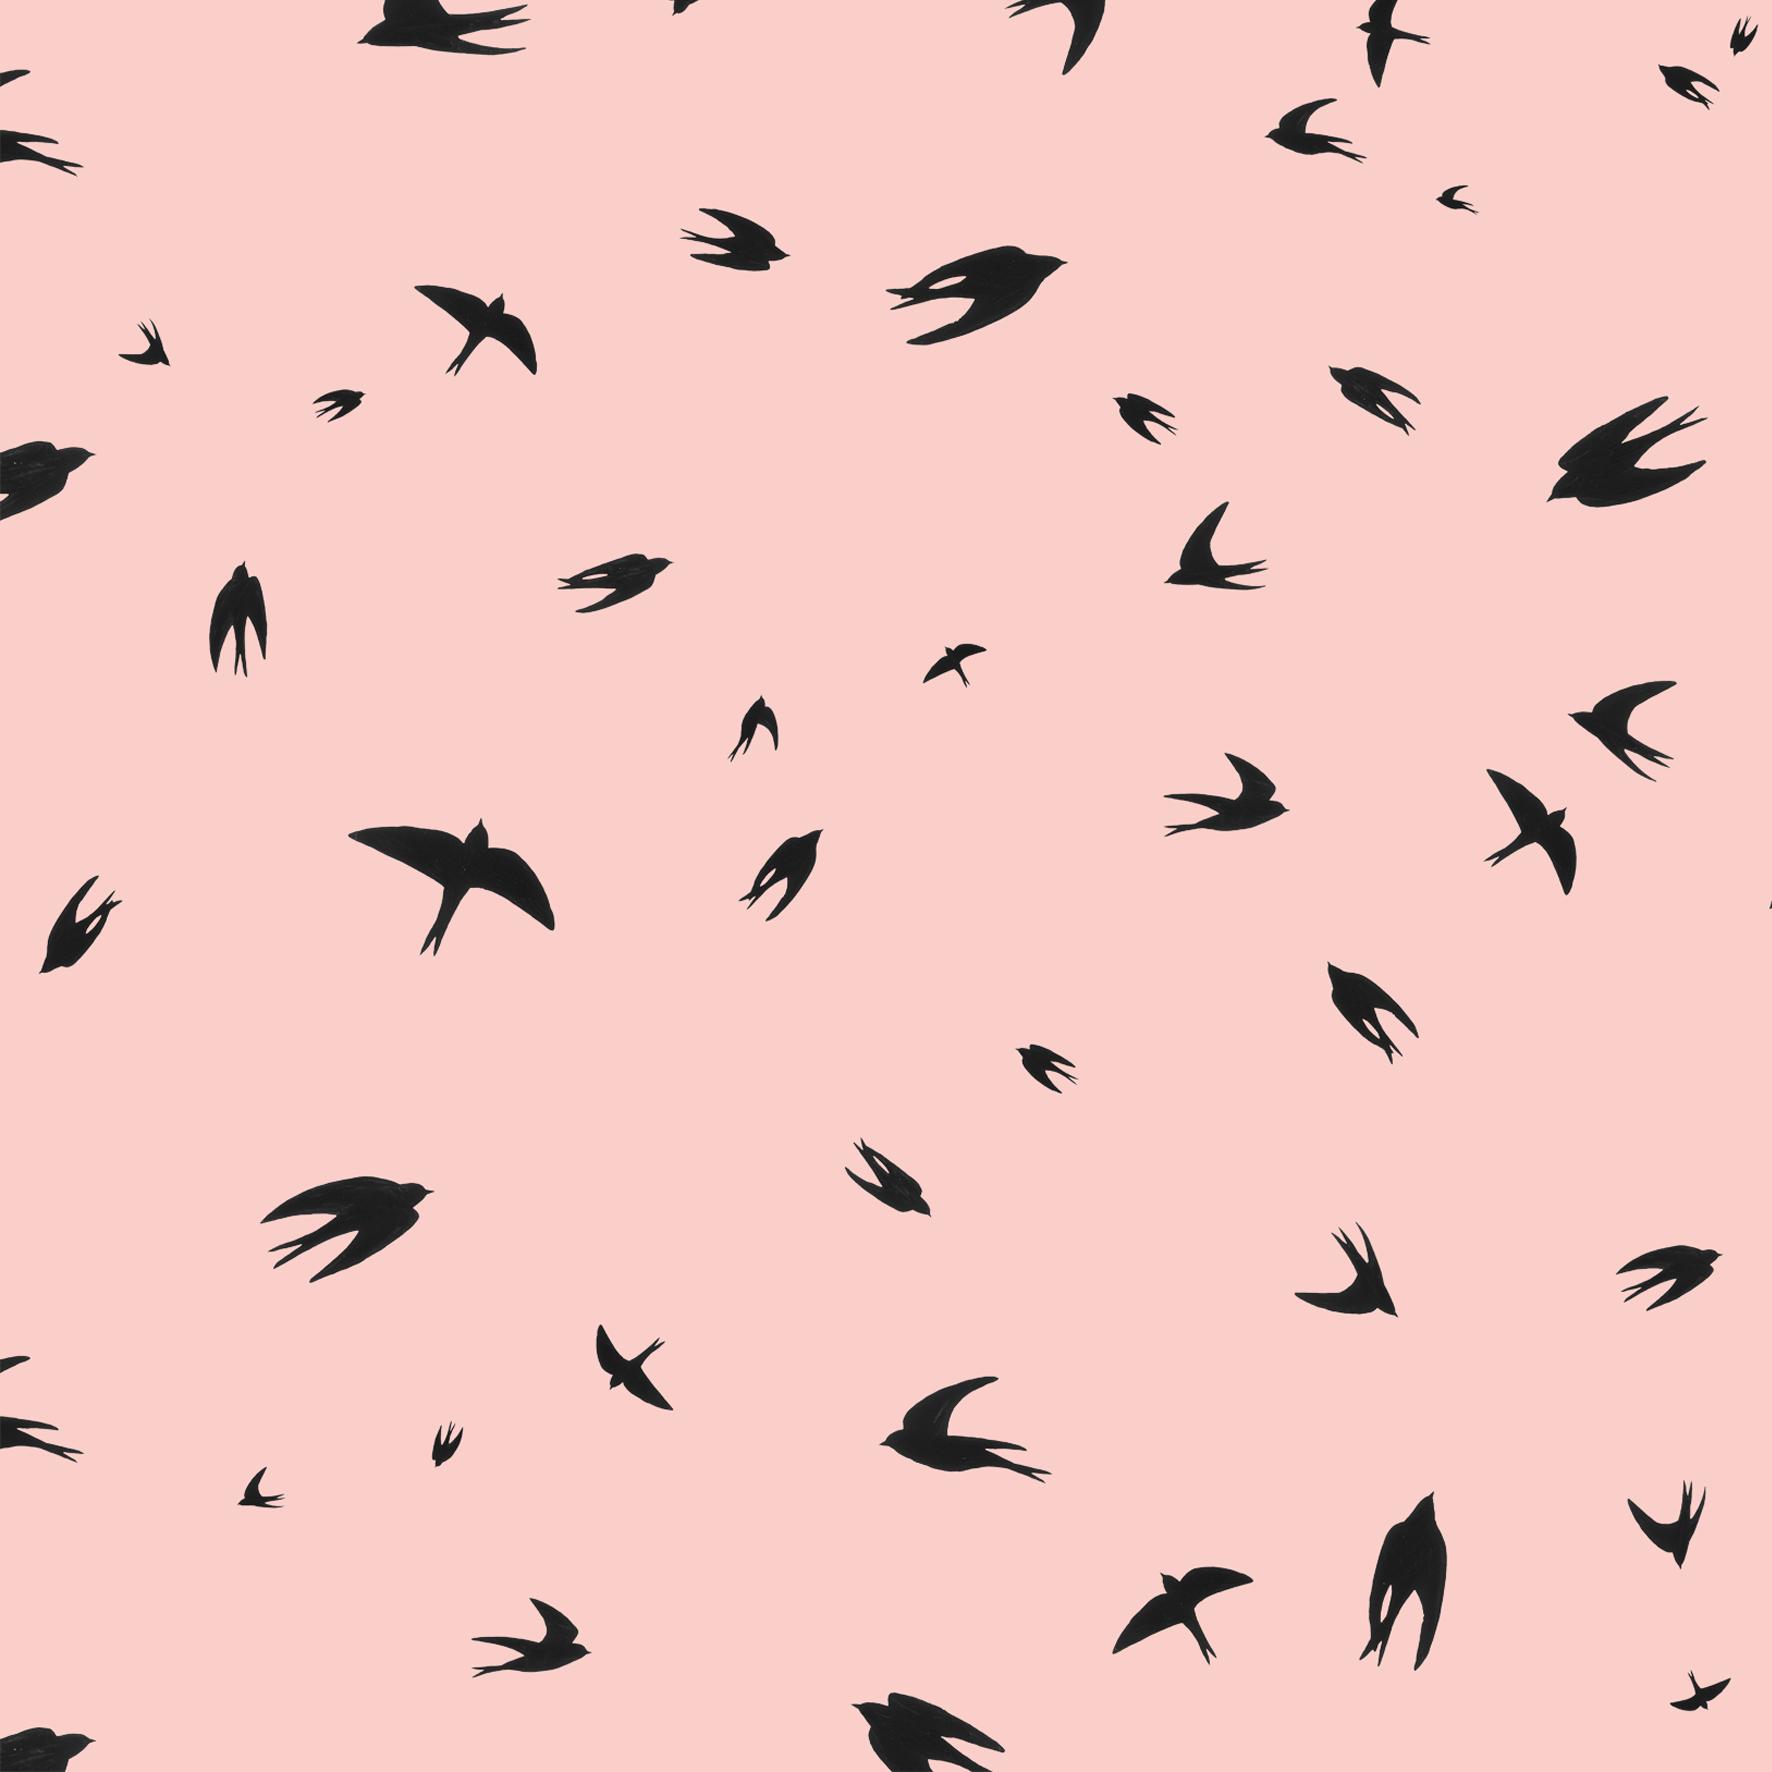 melissa boardman flying swallows pink.png